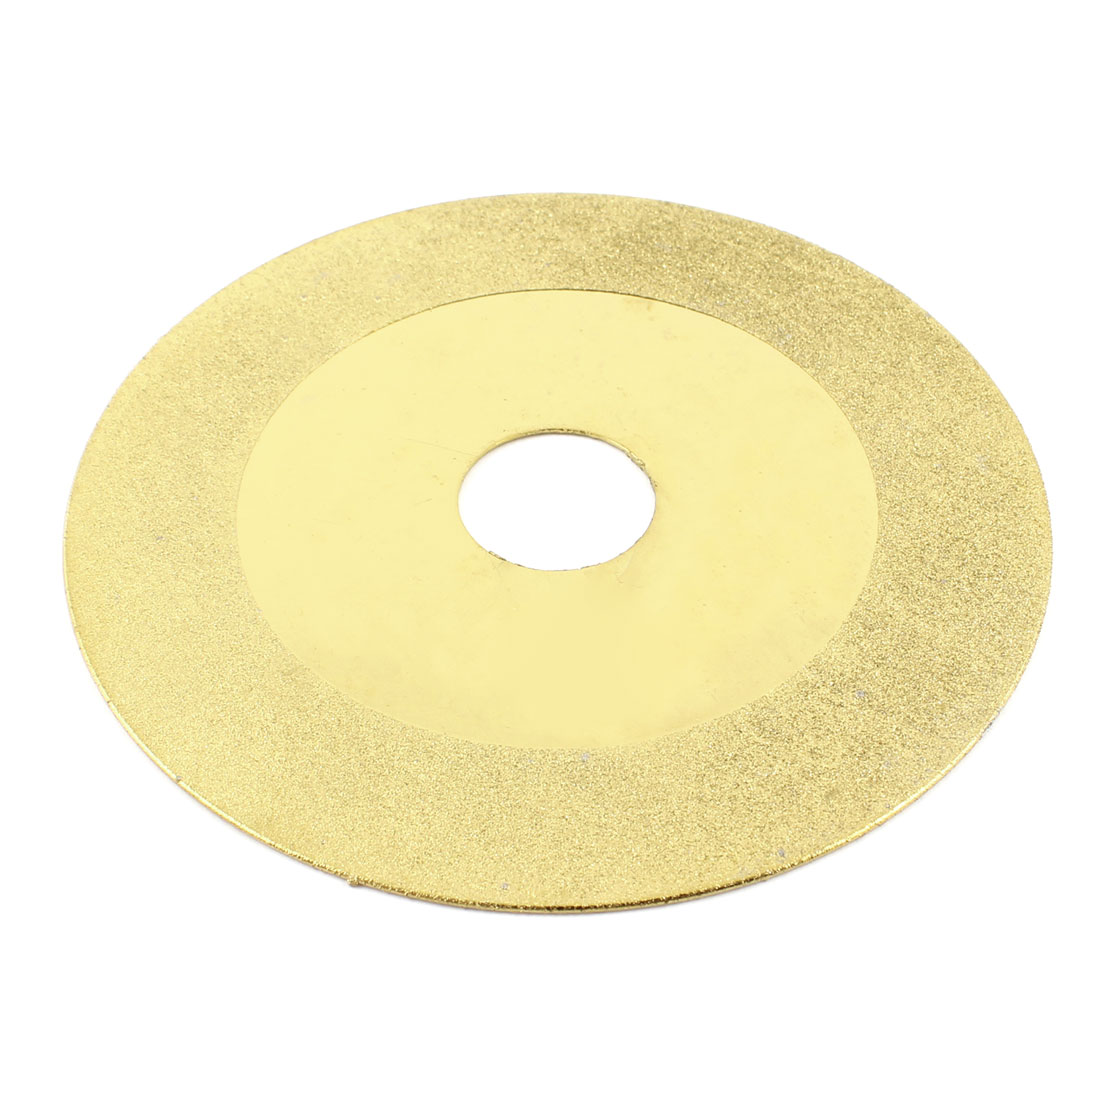 "3.9"" Outside Dia Double Side Ceramic Granite Diamond Saw Slice Cutting Disc"